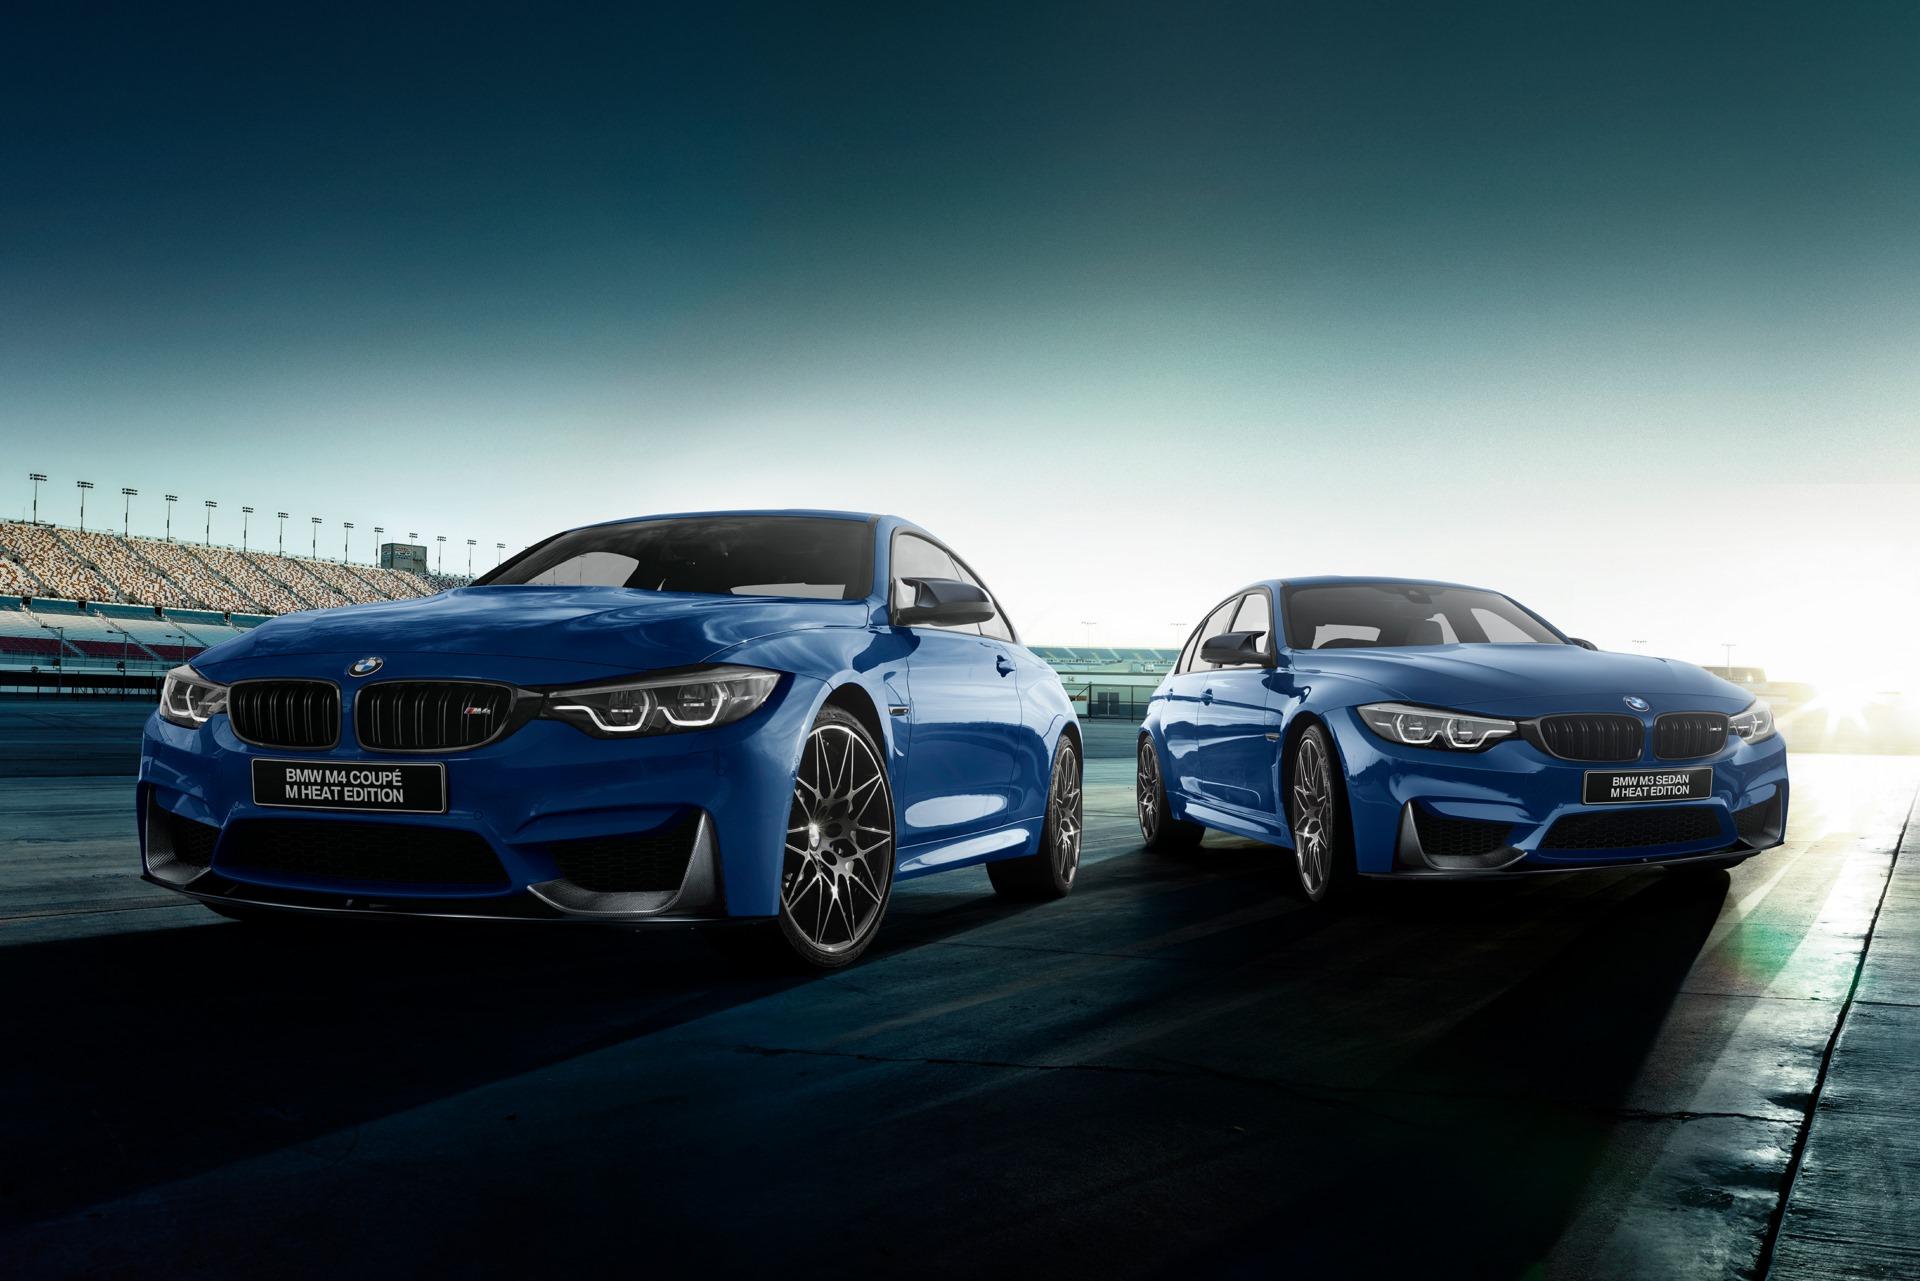 BMW M3 M4 Heat Edition 2018 1